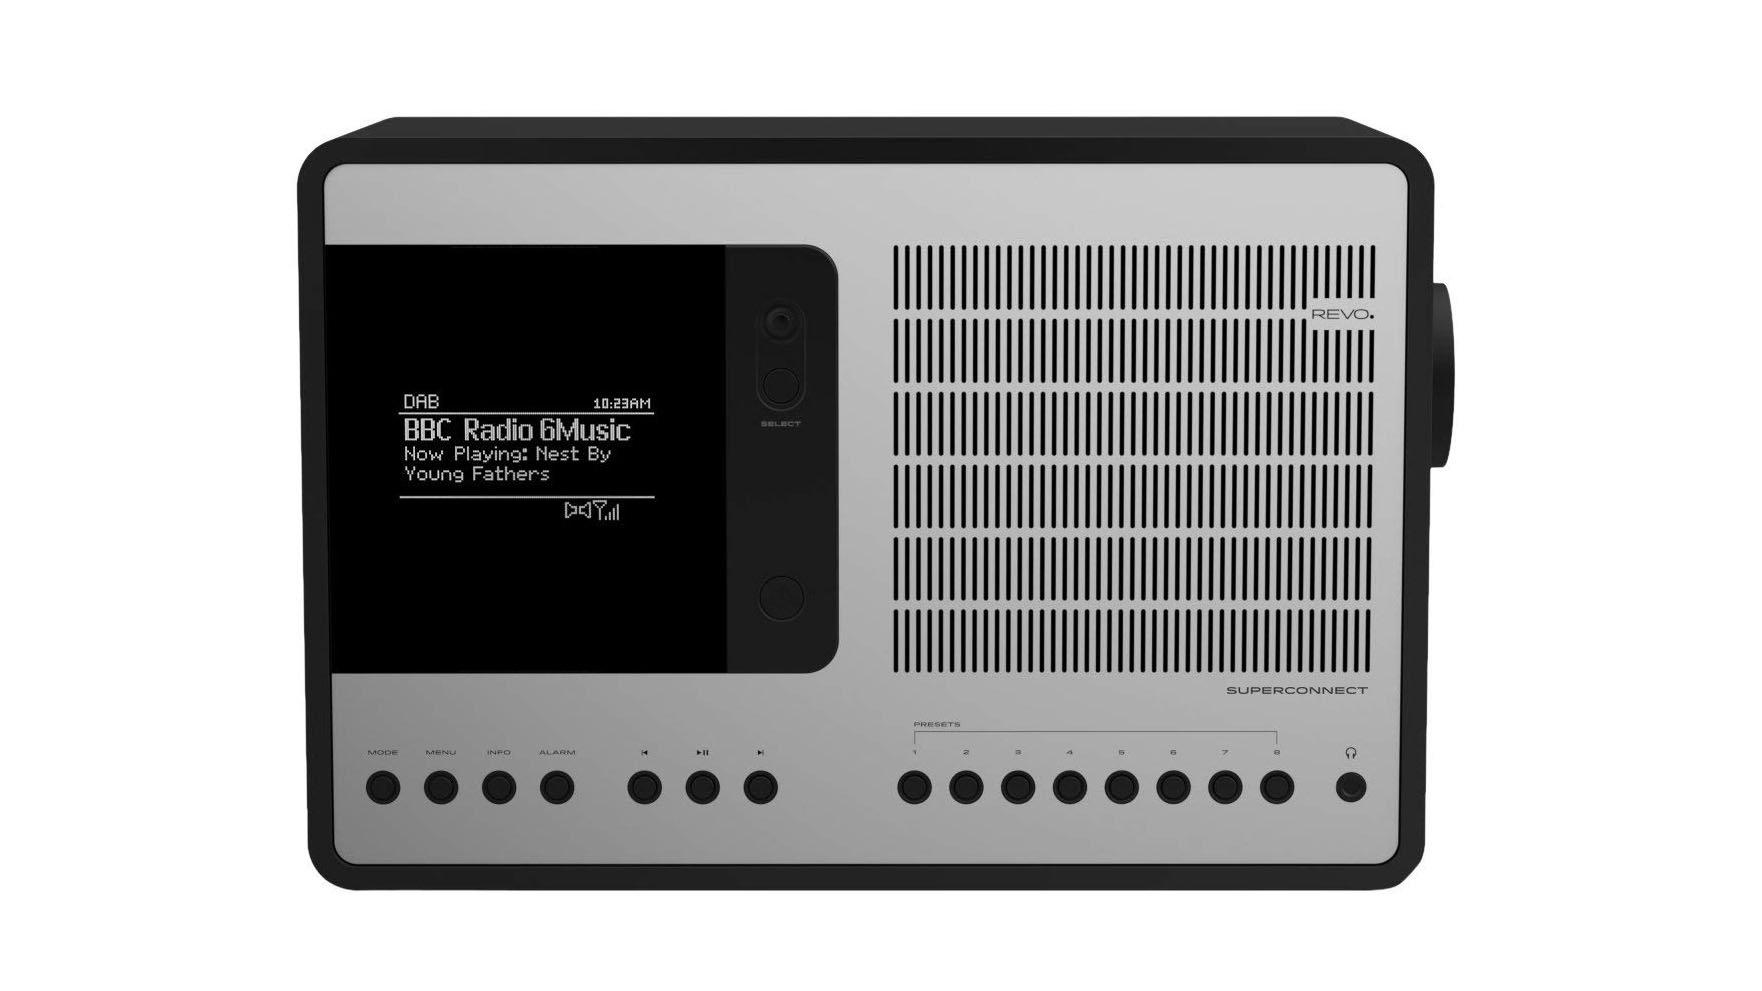 Best internet radio 2018: Great-sounding, easy-to-use internet radio